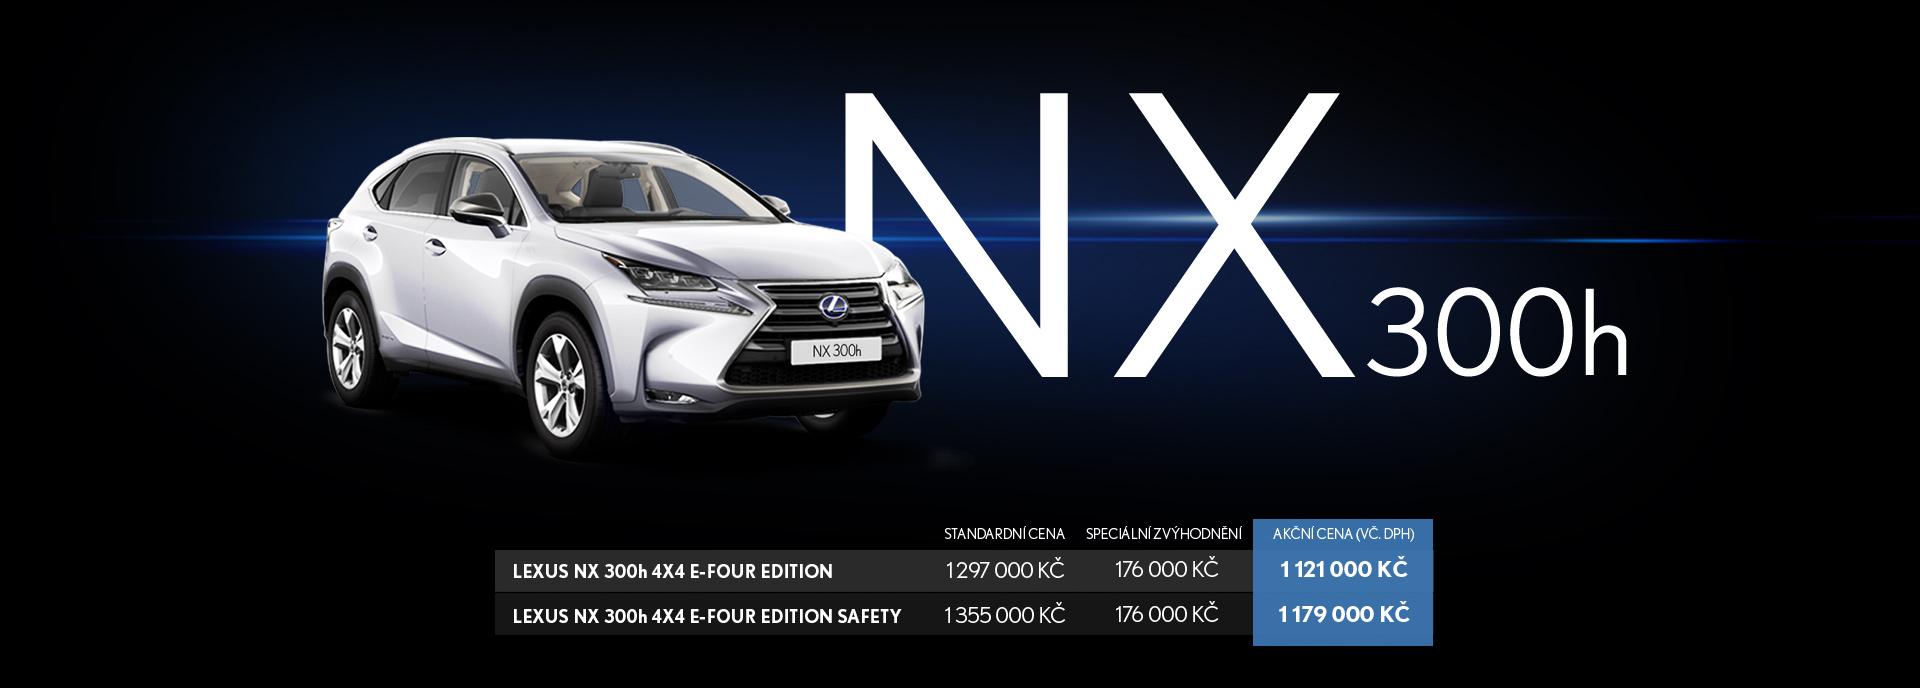 NX 300h Banner Image